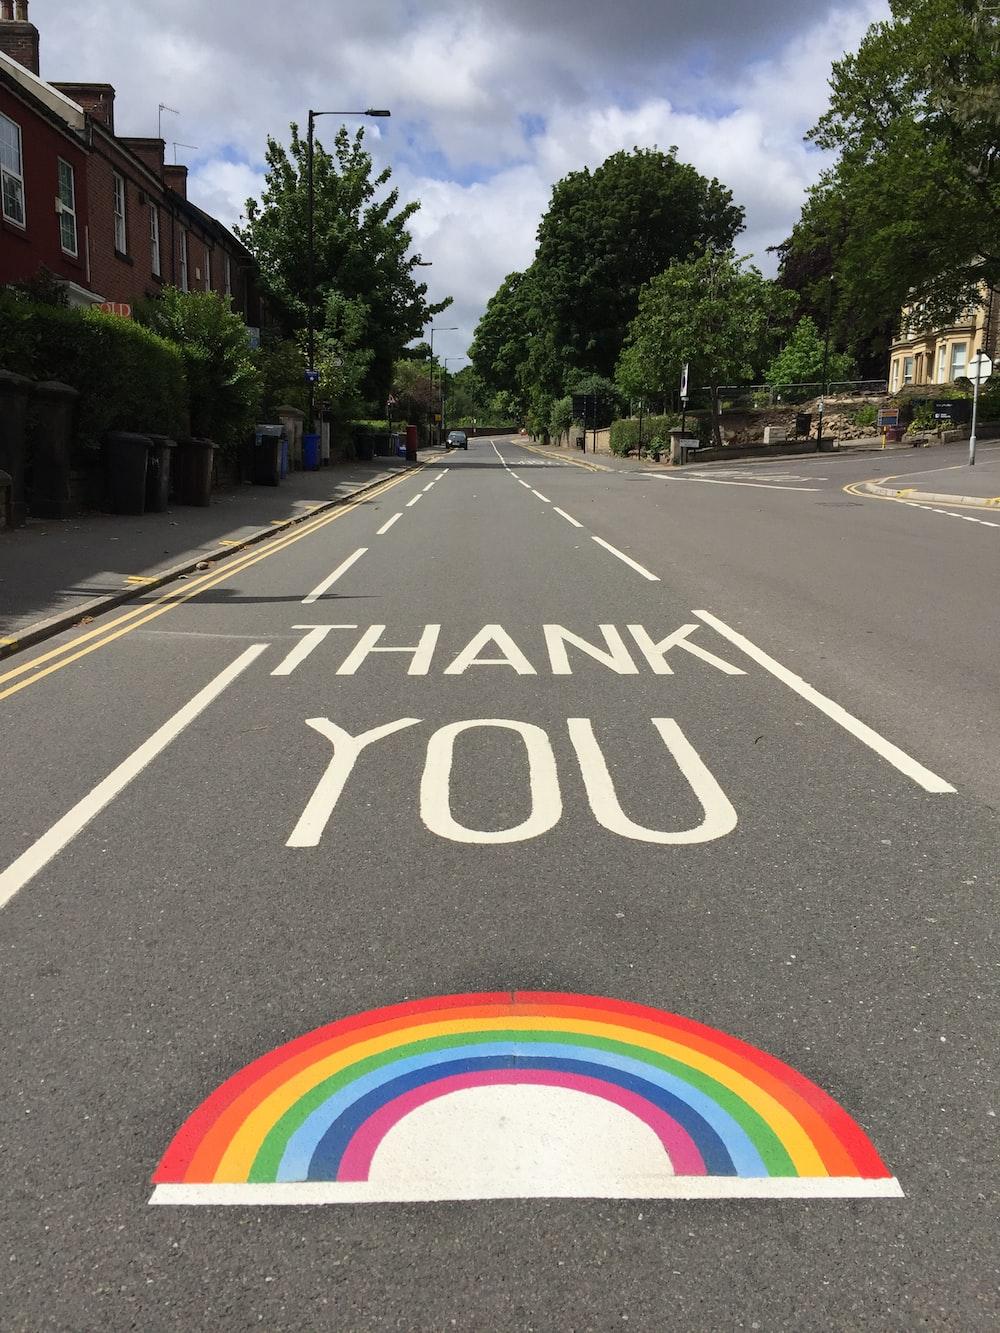 black asphalt road with rainbow sign